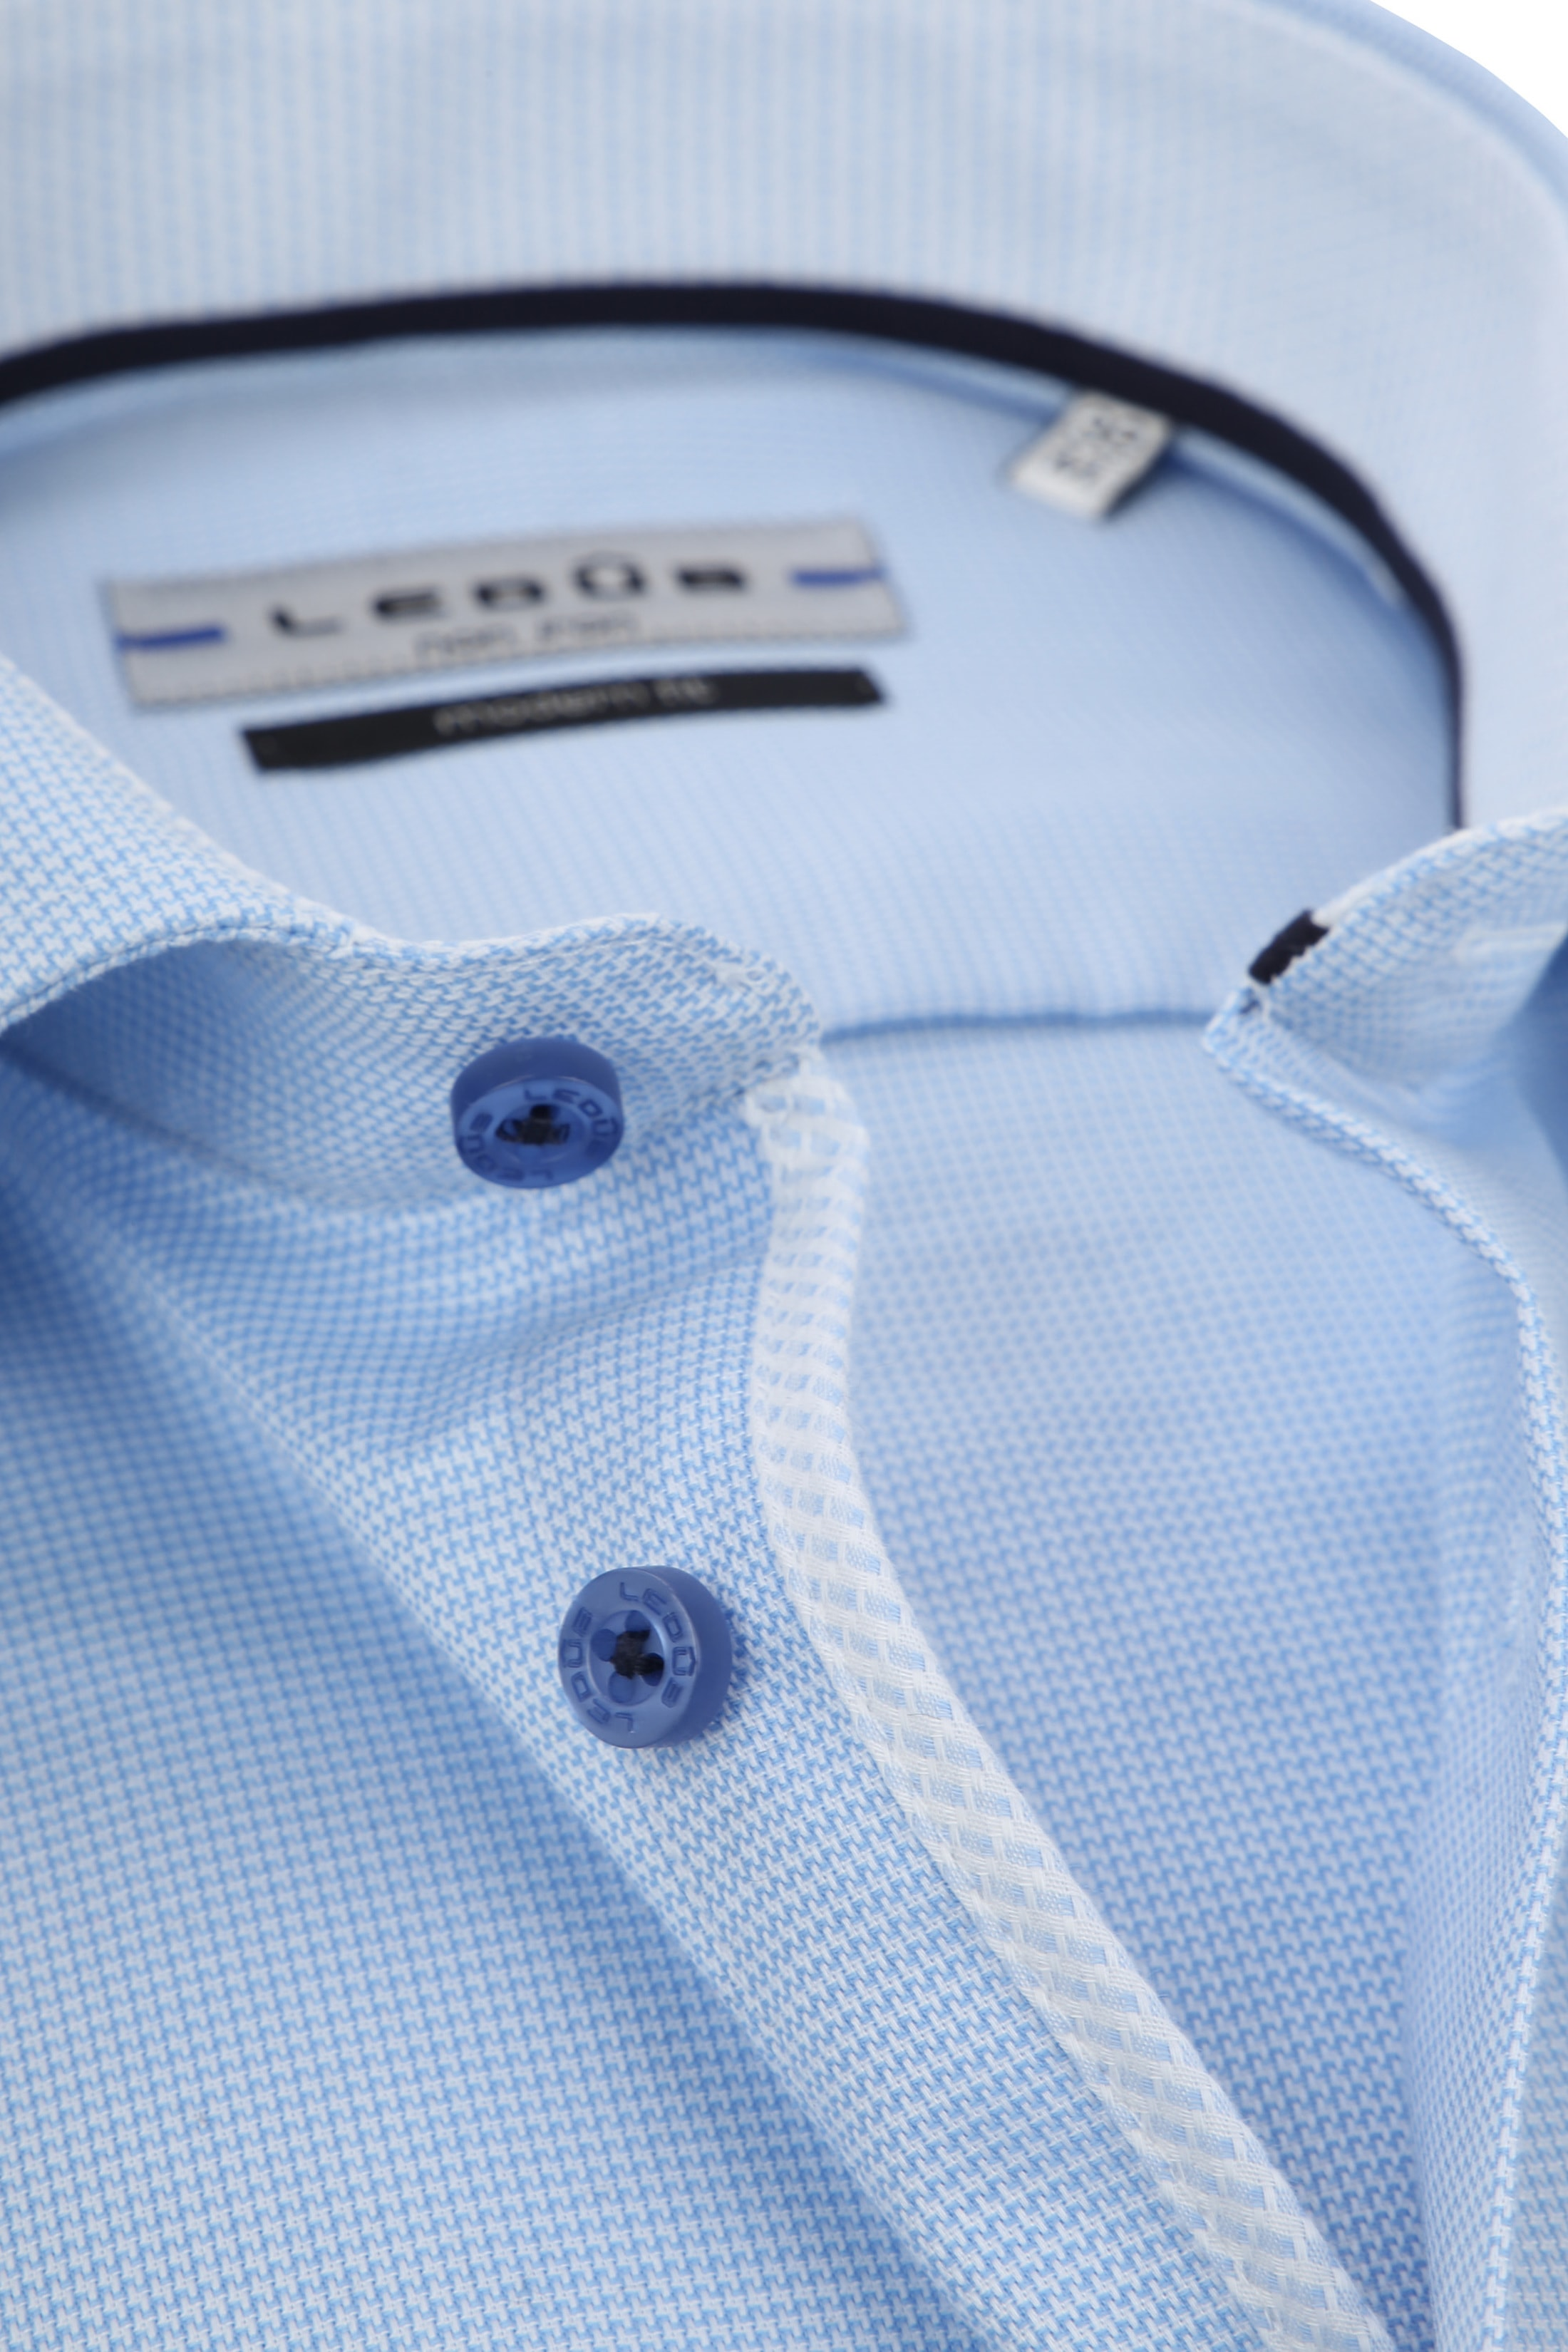 Ledub Overhemd Blauw Non Iron MF foto 1